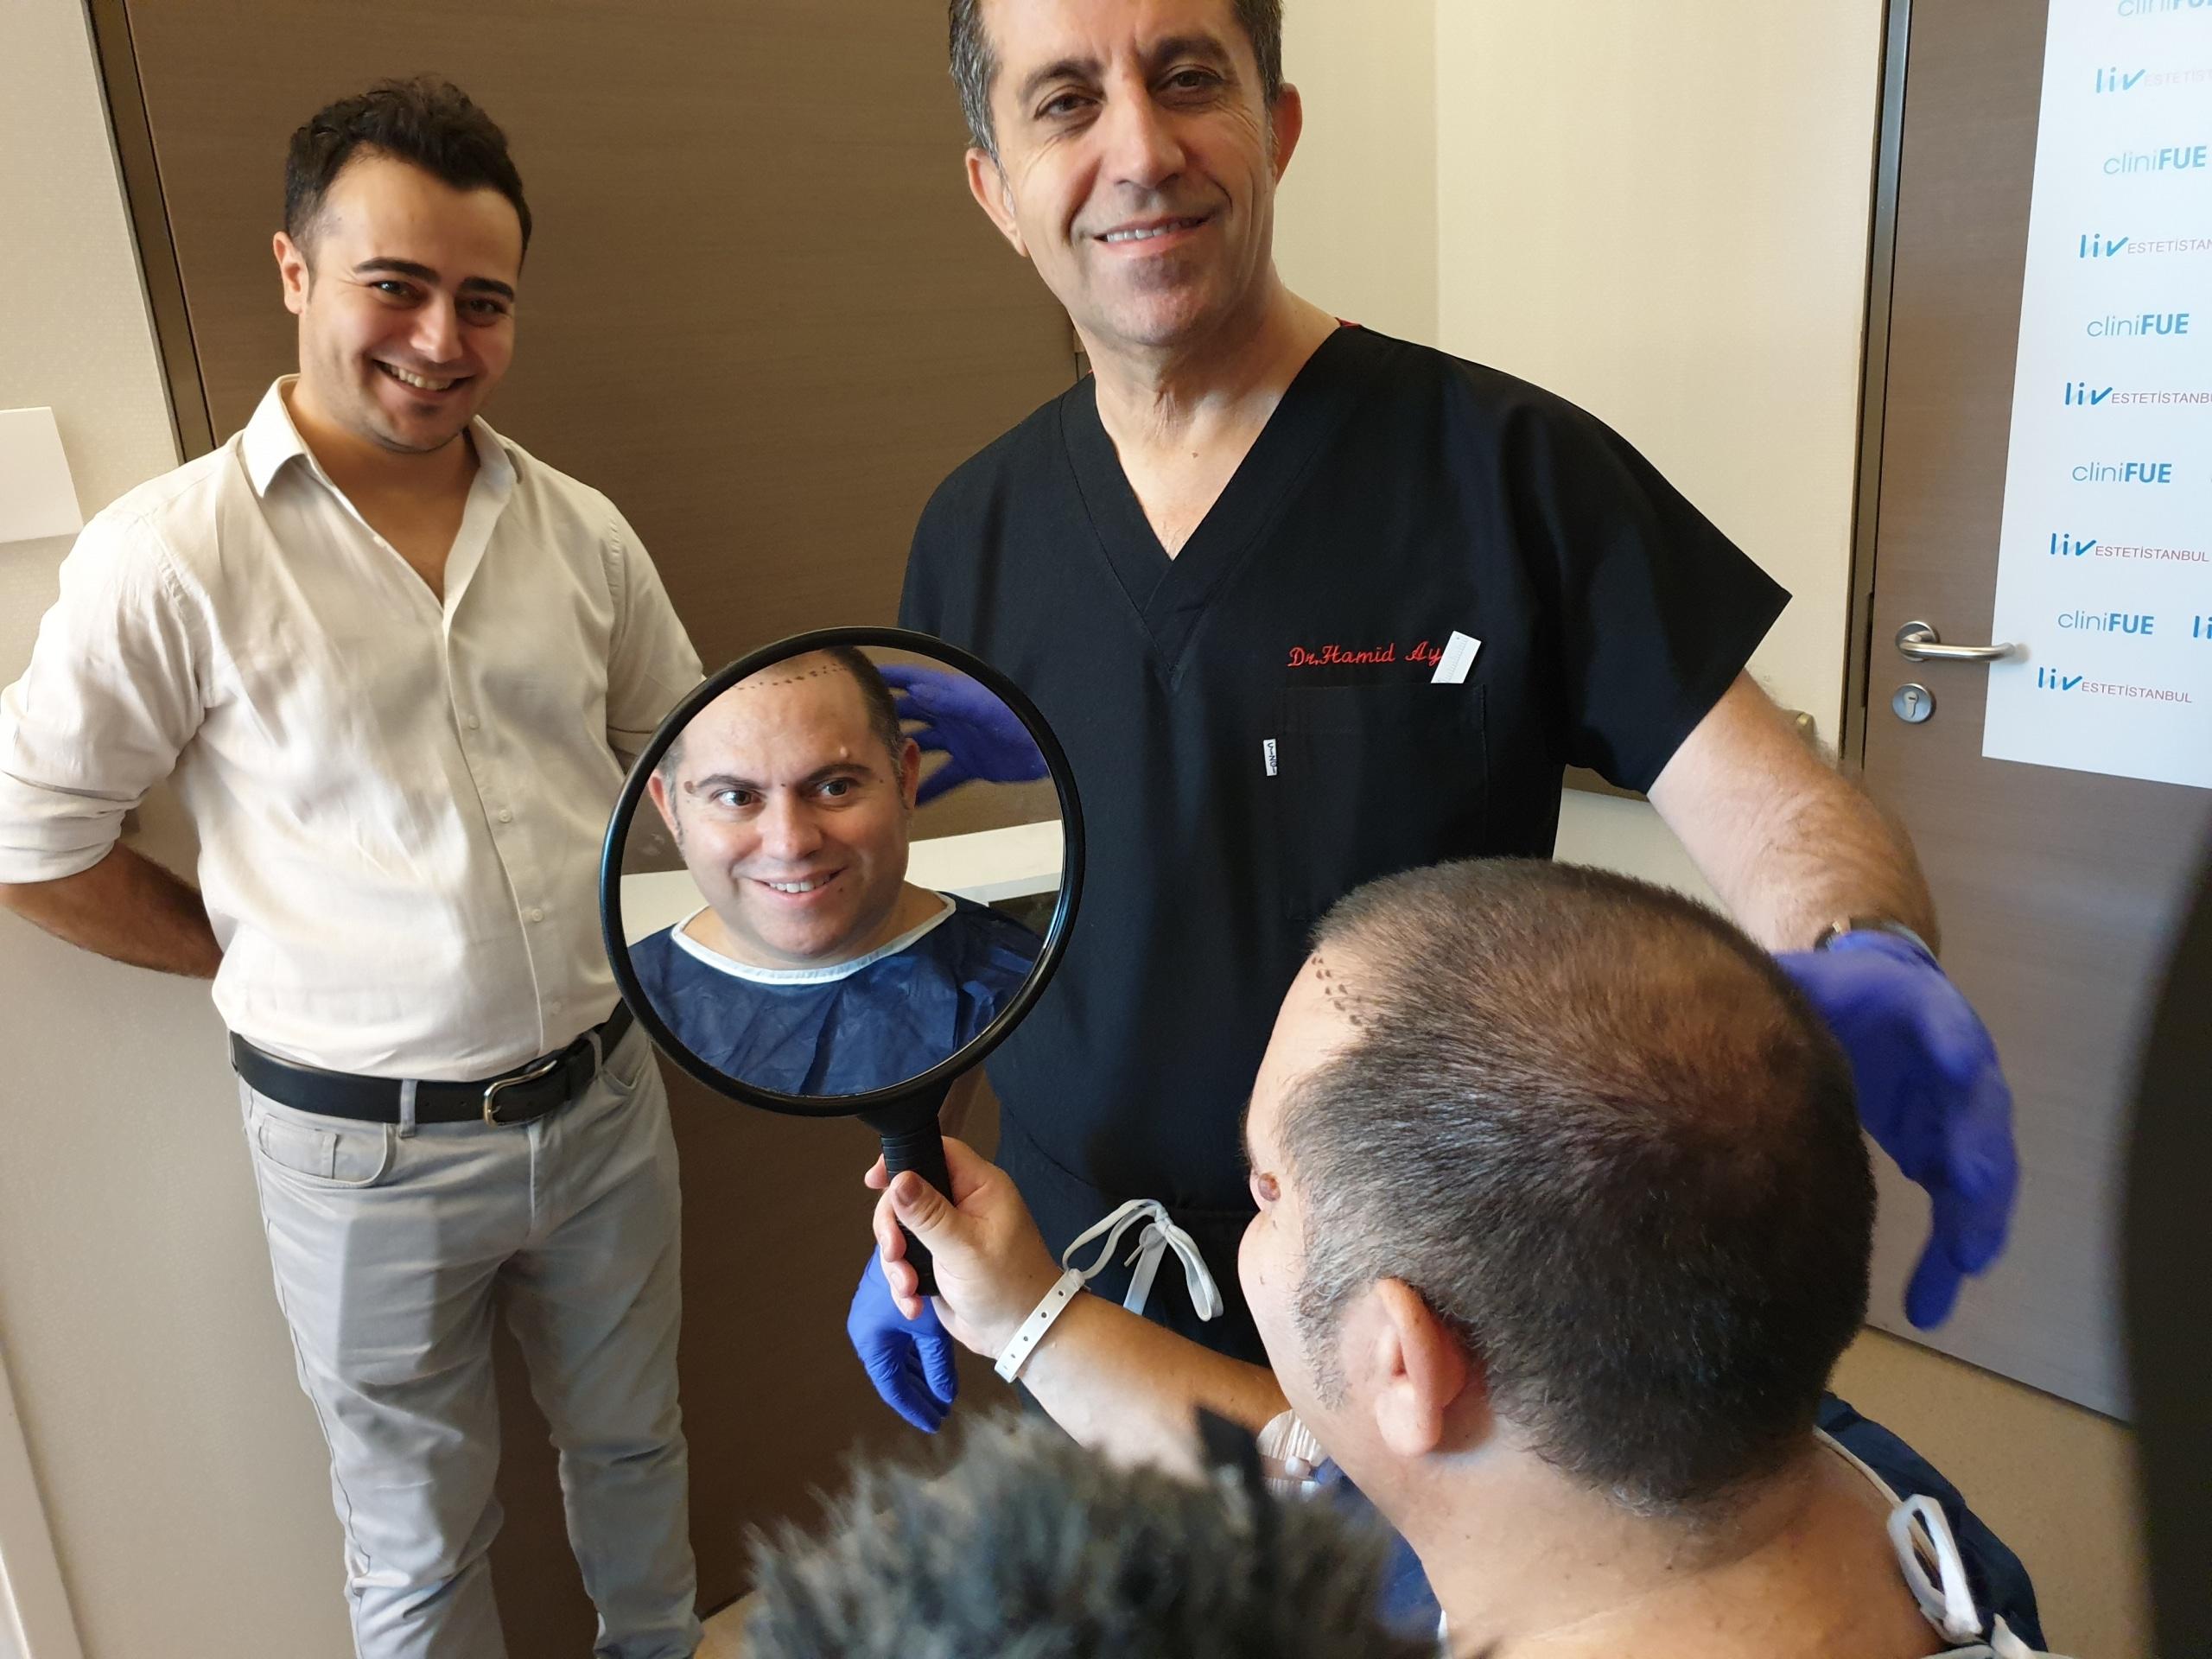 Injerto capilar de Ricardo Luengo Pelukeros Youtuber peluquero con más de 400,000 suscriptores con cliniFUE